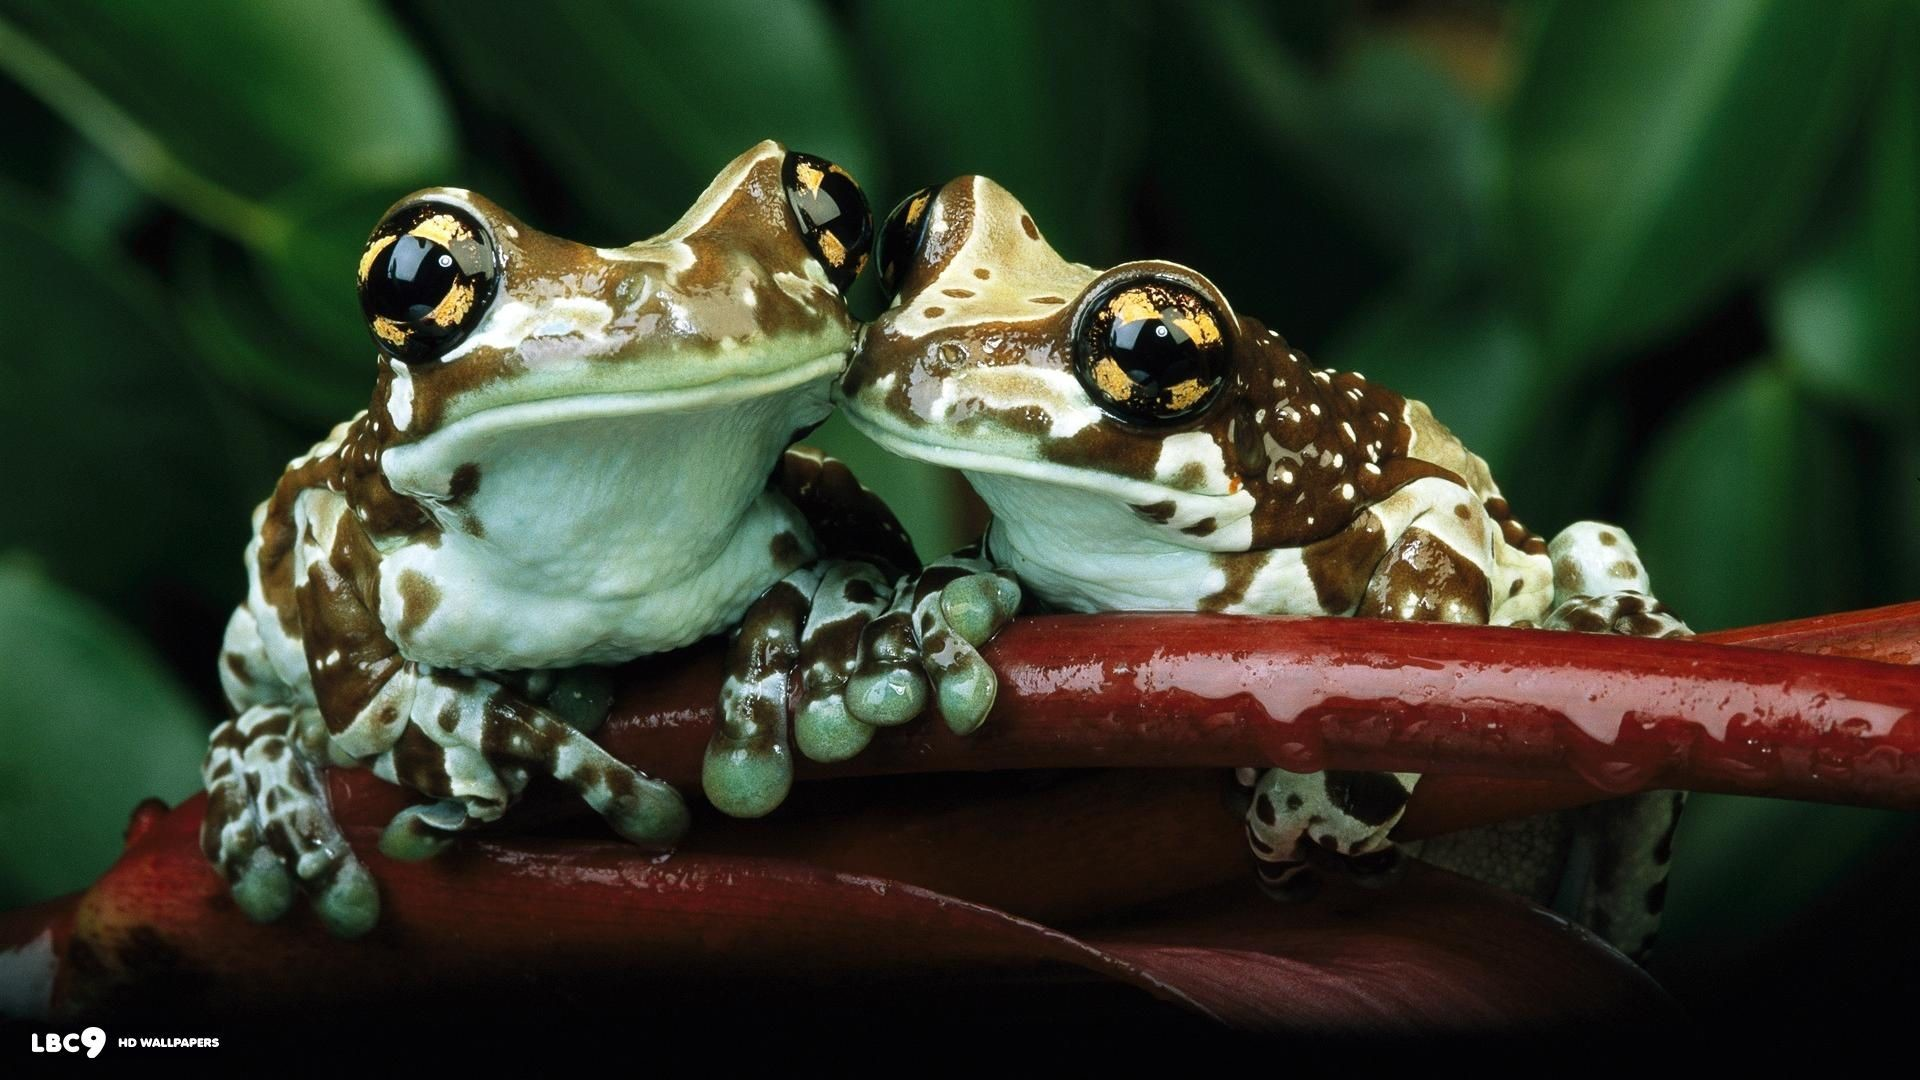 Res: 1920x1080, reptiles and amphibians | frog wallpaper 55/86 | reptiles and amphibians hd  backgrounds